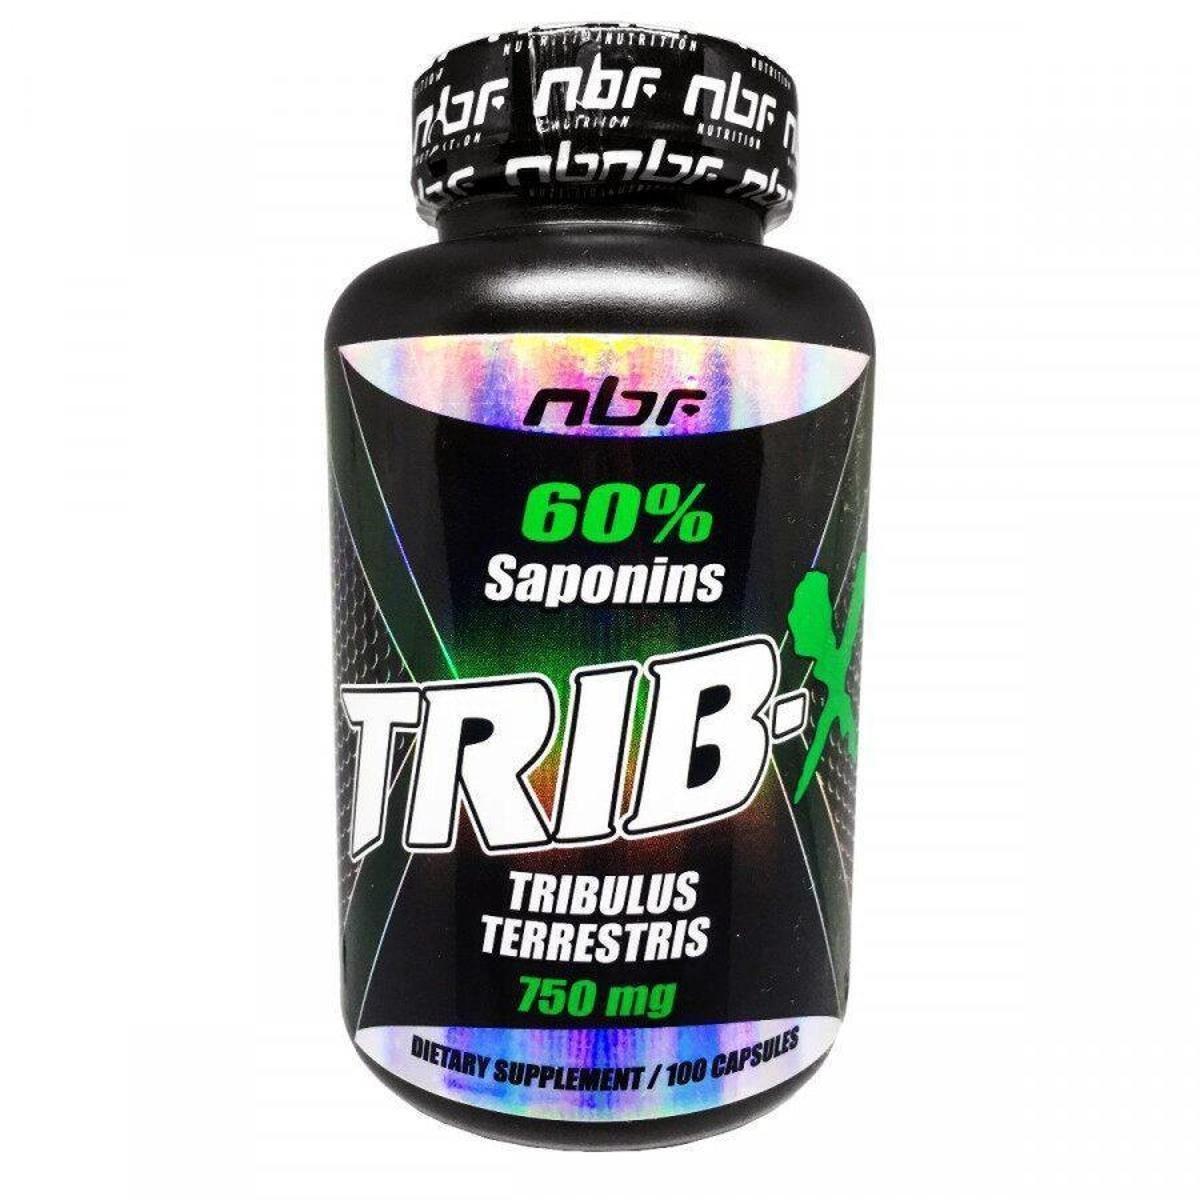 Tribulus trib-x 750mg 100caps - NBF